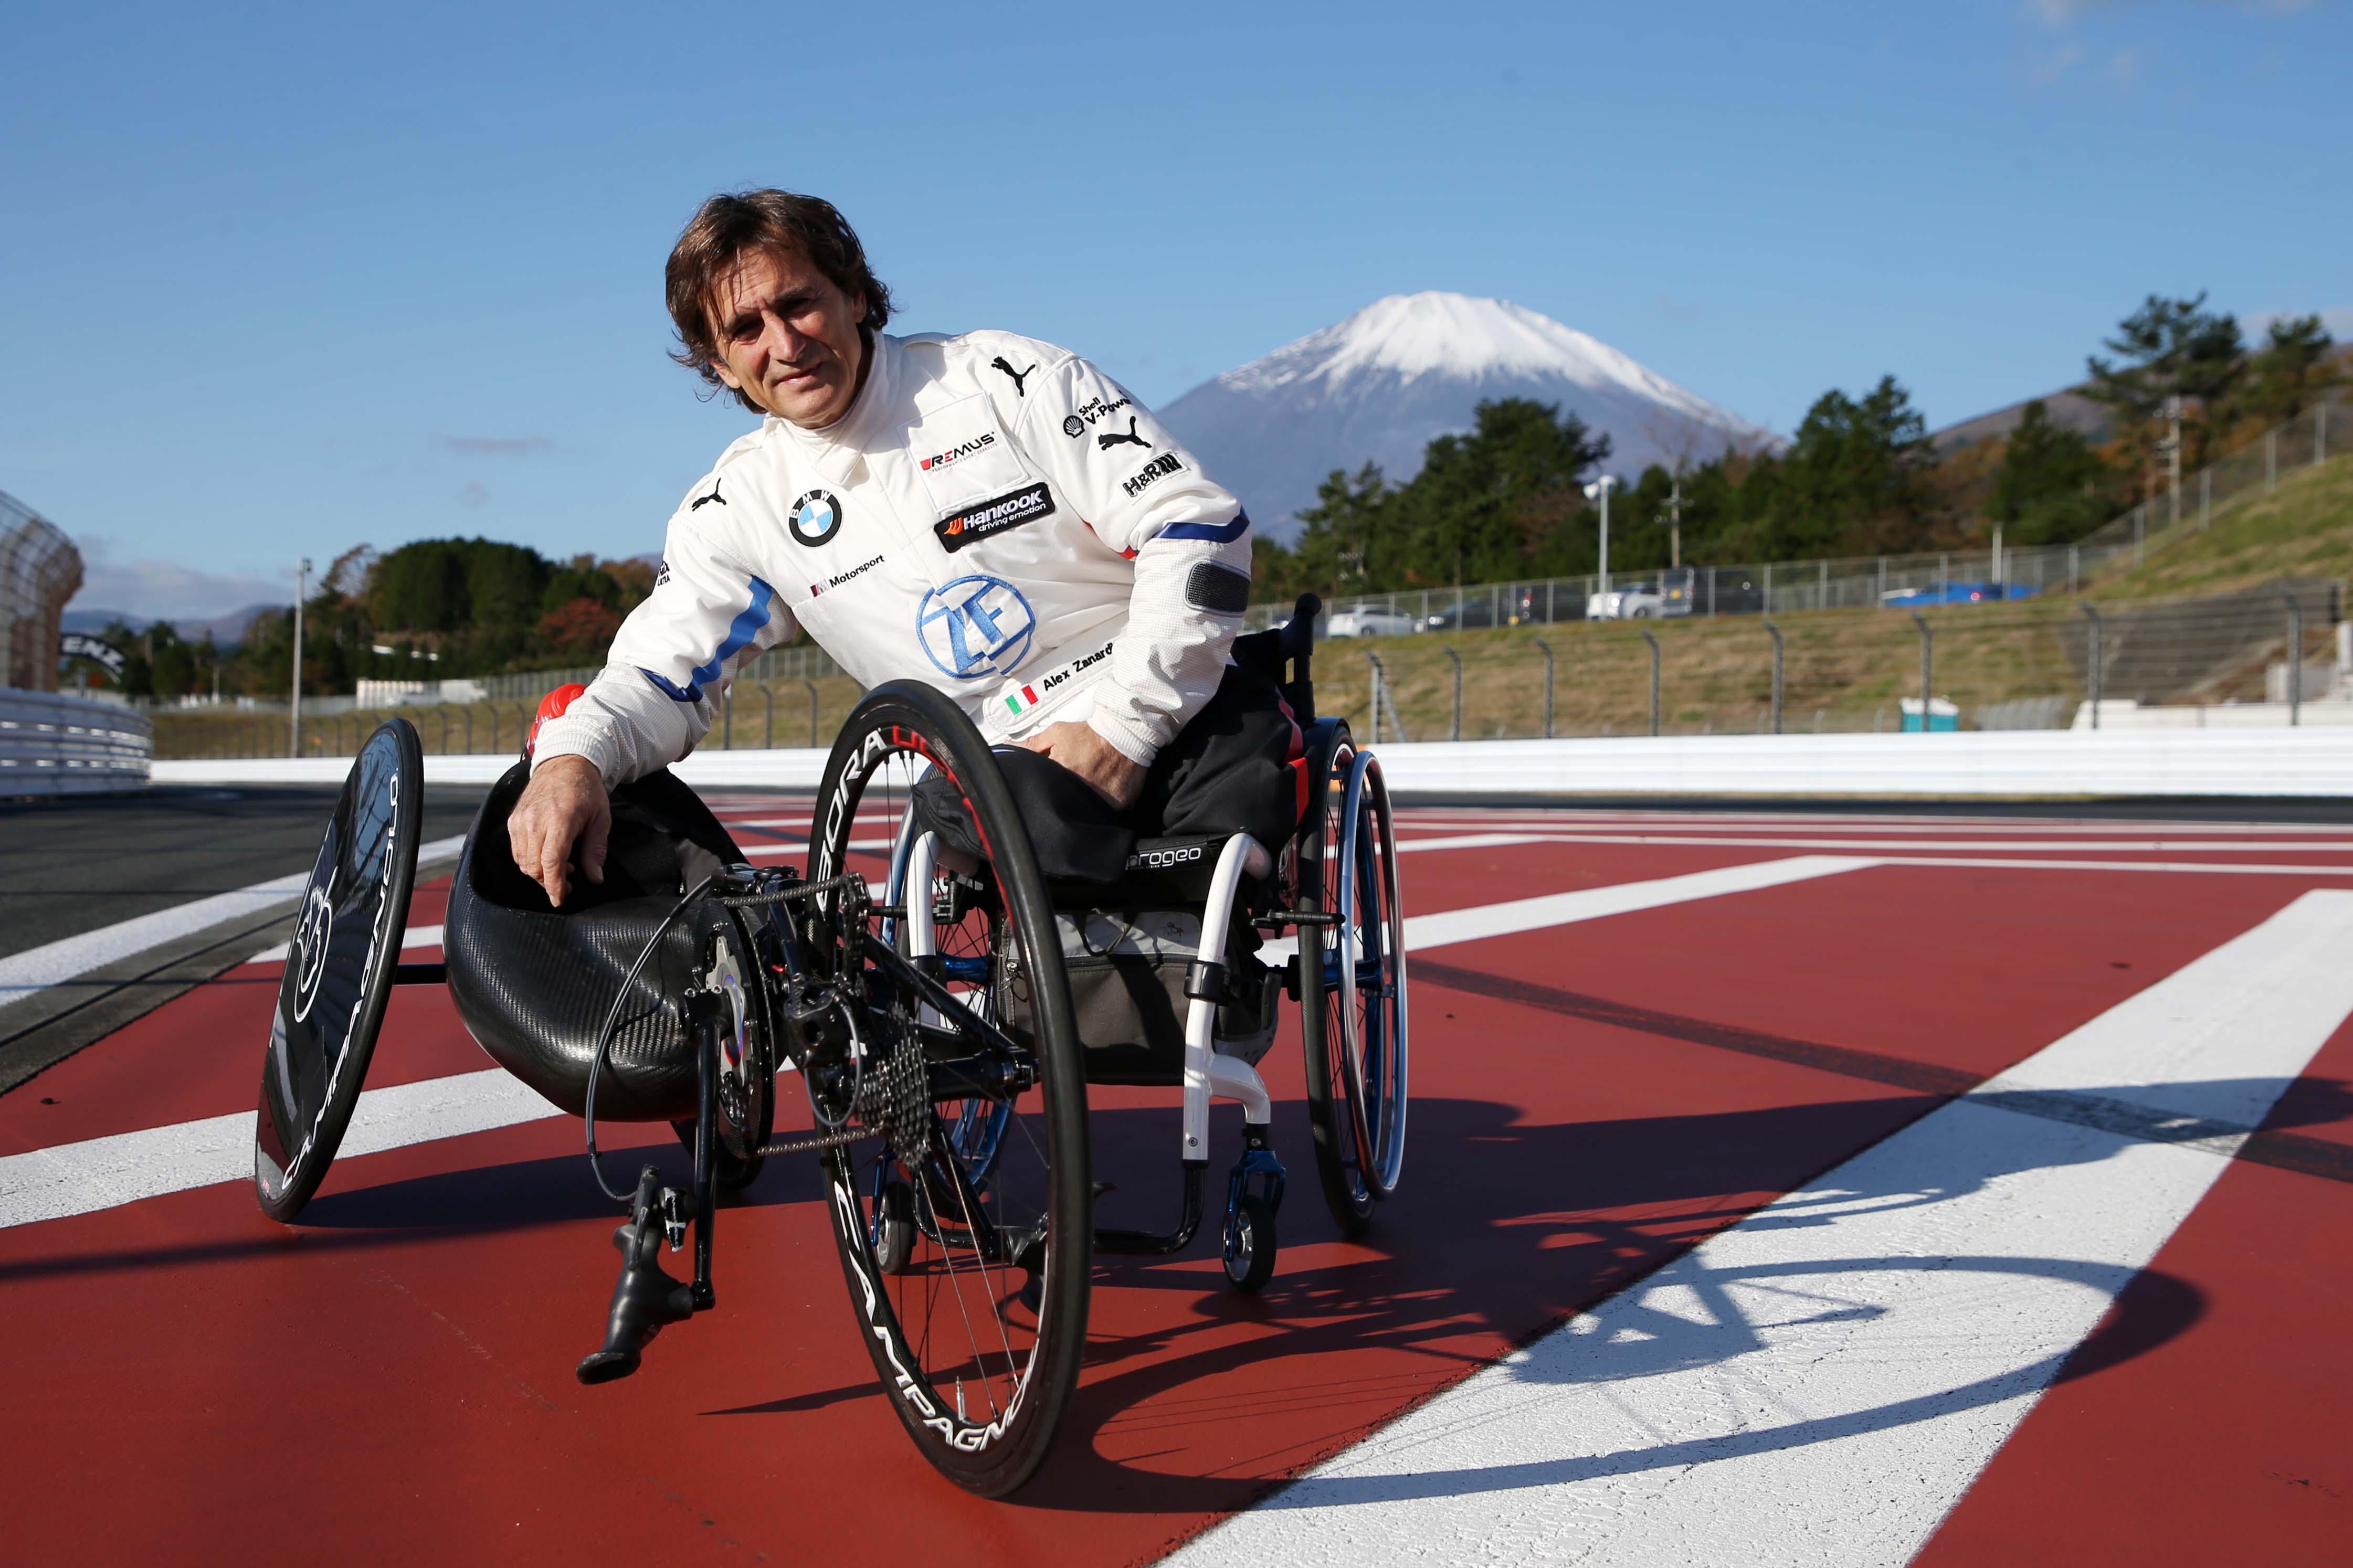 Fuji International Speedway: Zanardi si allena per Tokyo 2020